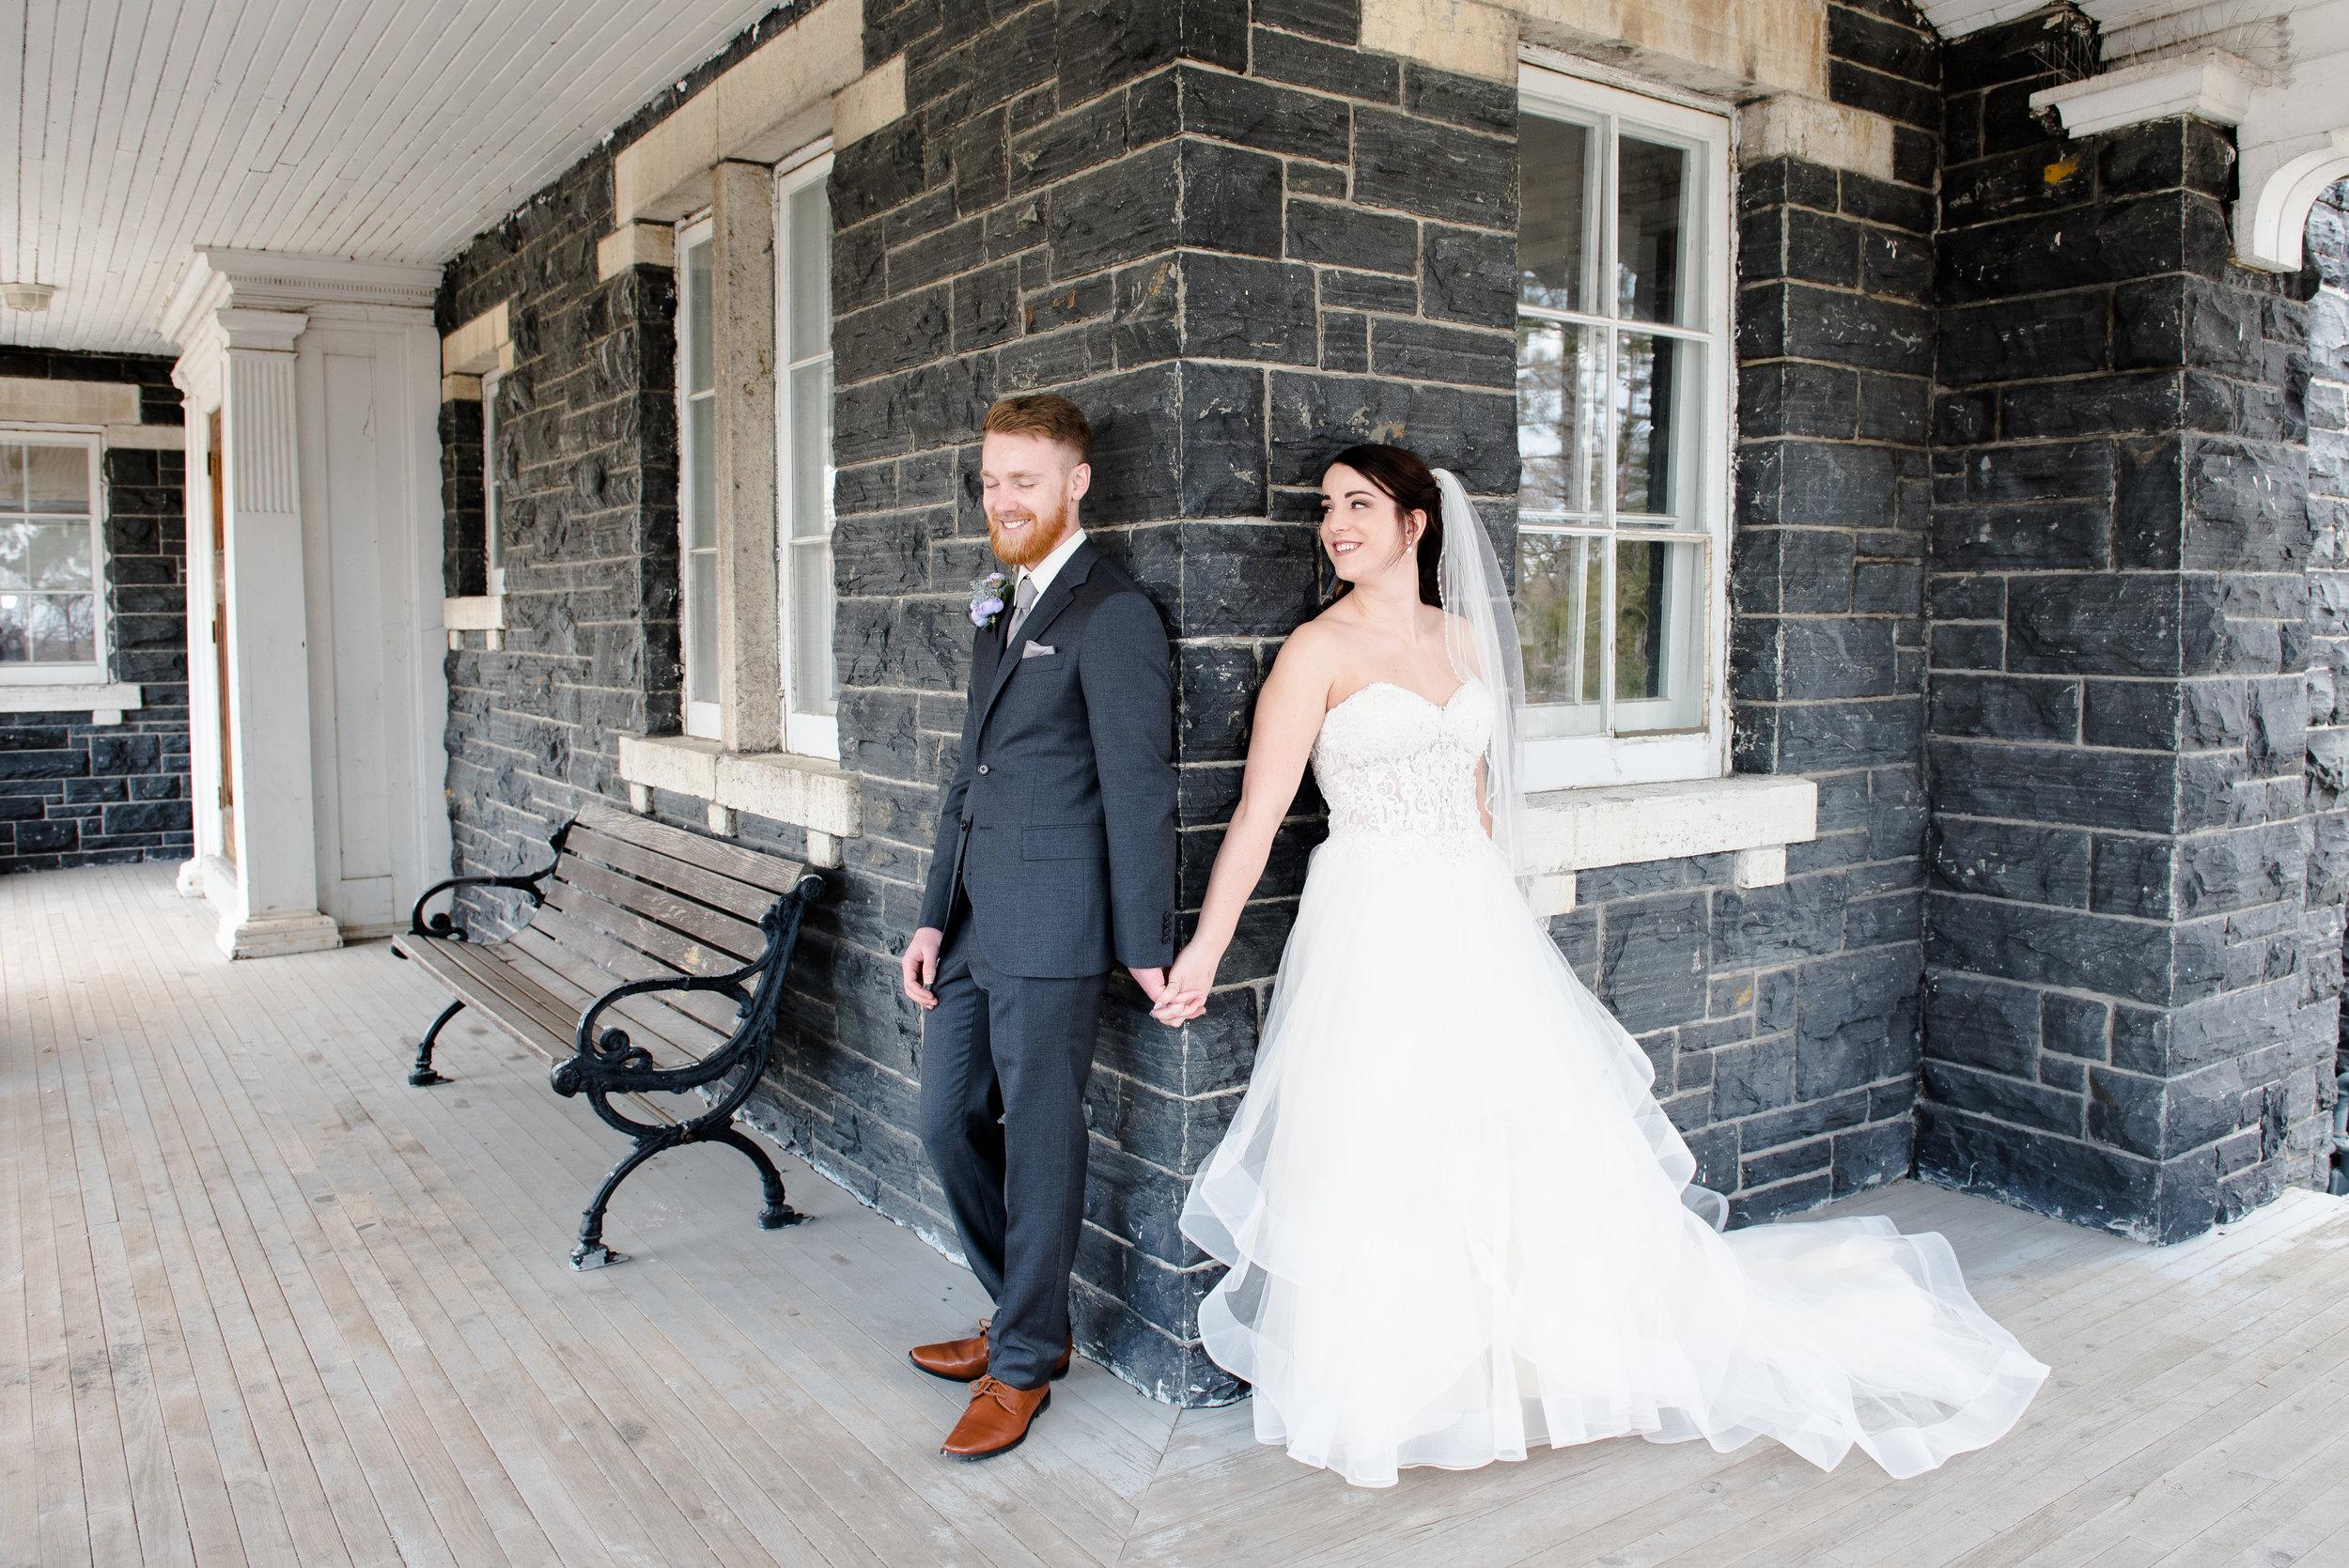 chesley_morgan_wedding-70.jpg